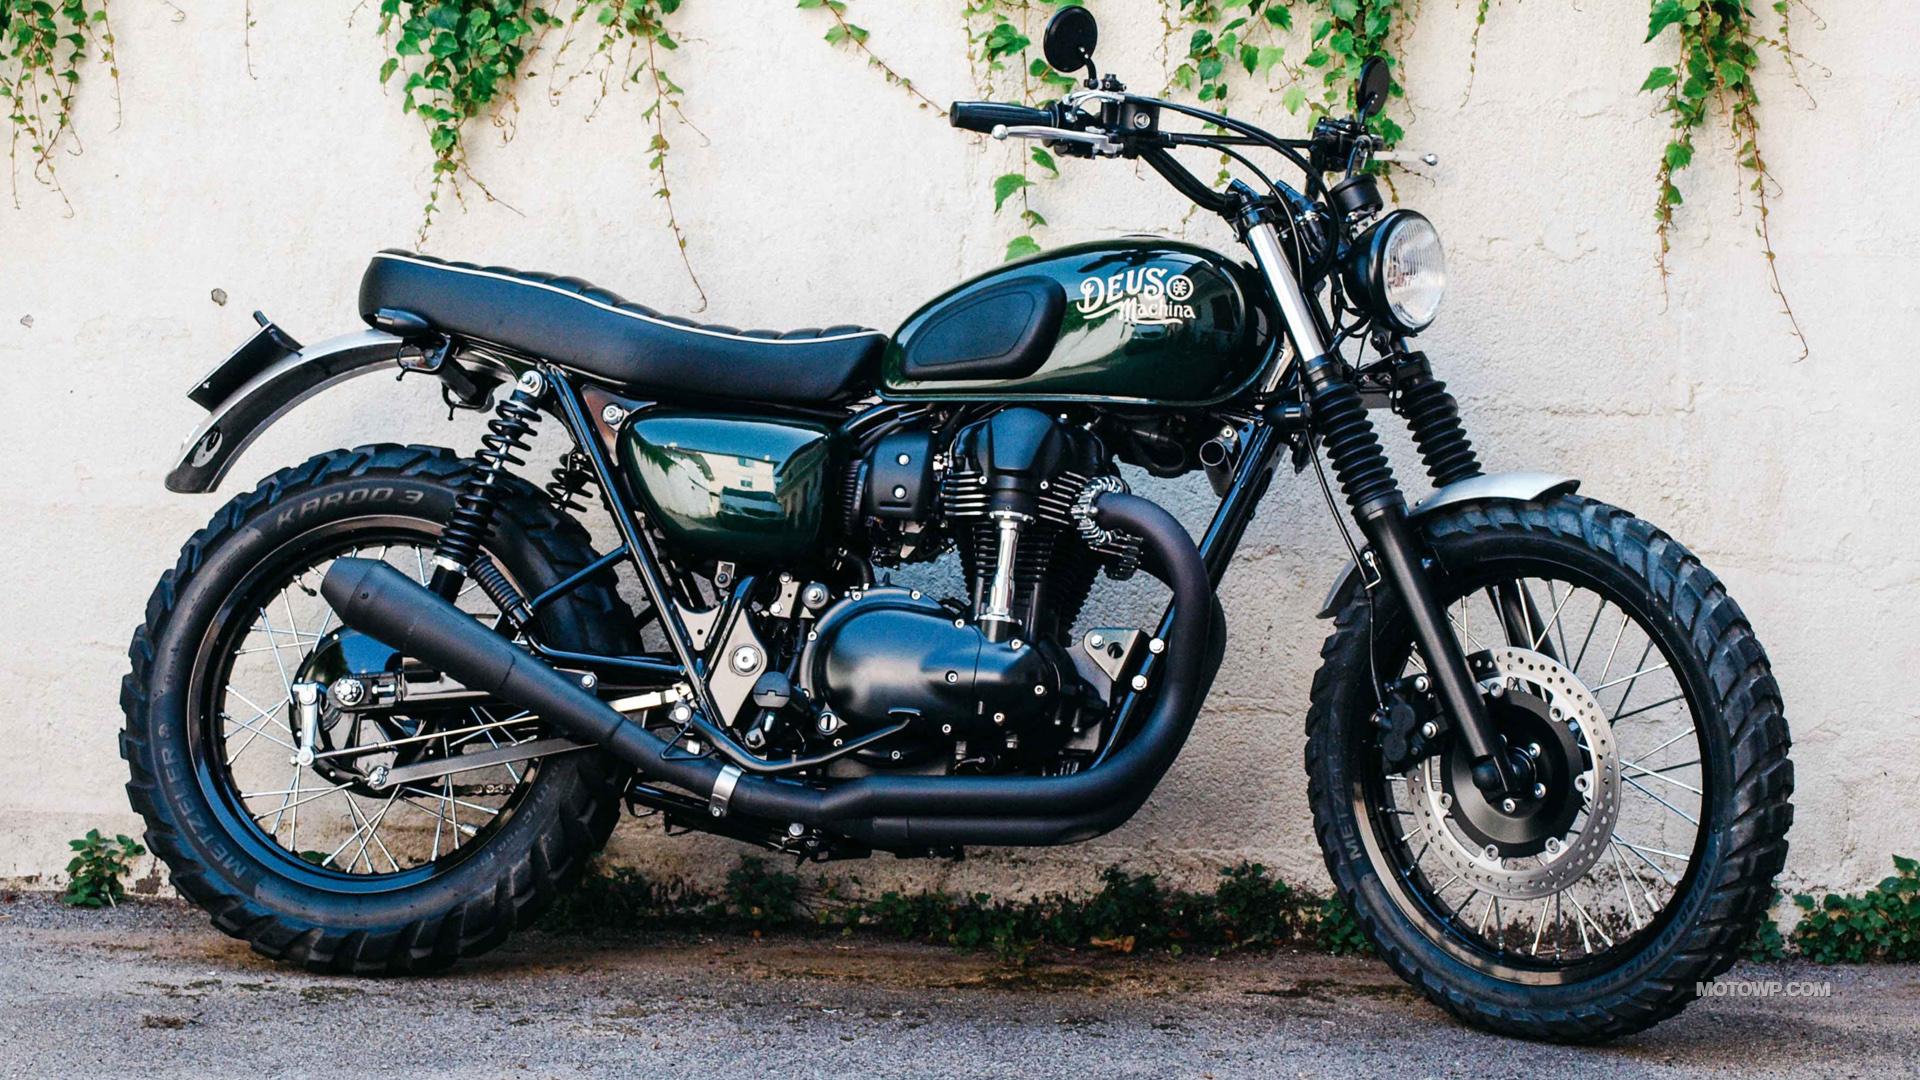 Custom Motorcycle Desktop Wallpapers Deus Ex Machina Orsini Viper